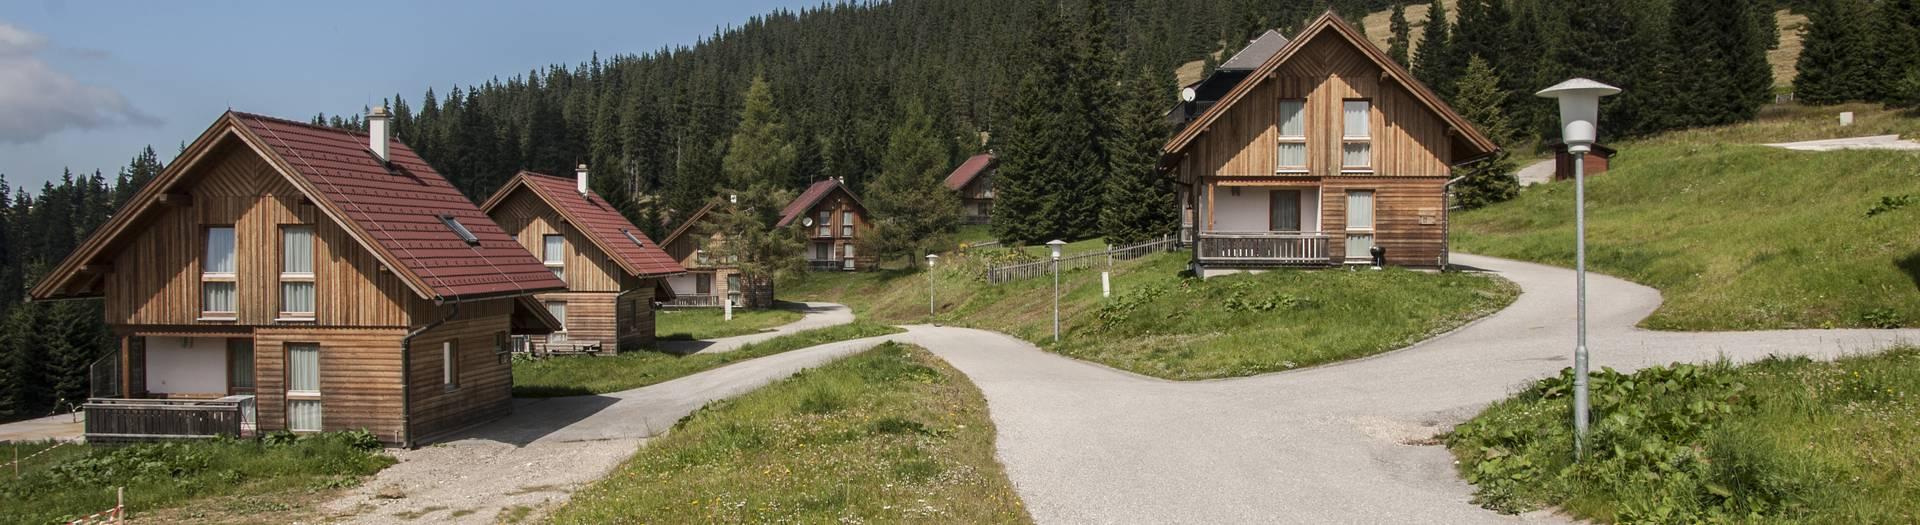 Almdörfer in Frantschach-St.Gertraud im Lavanttal